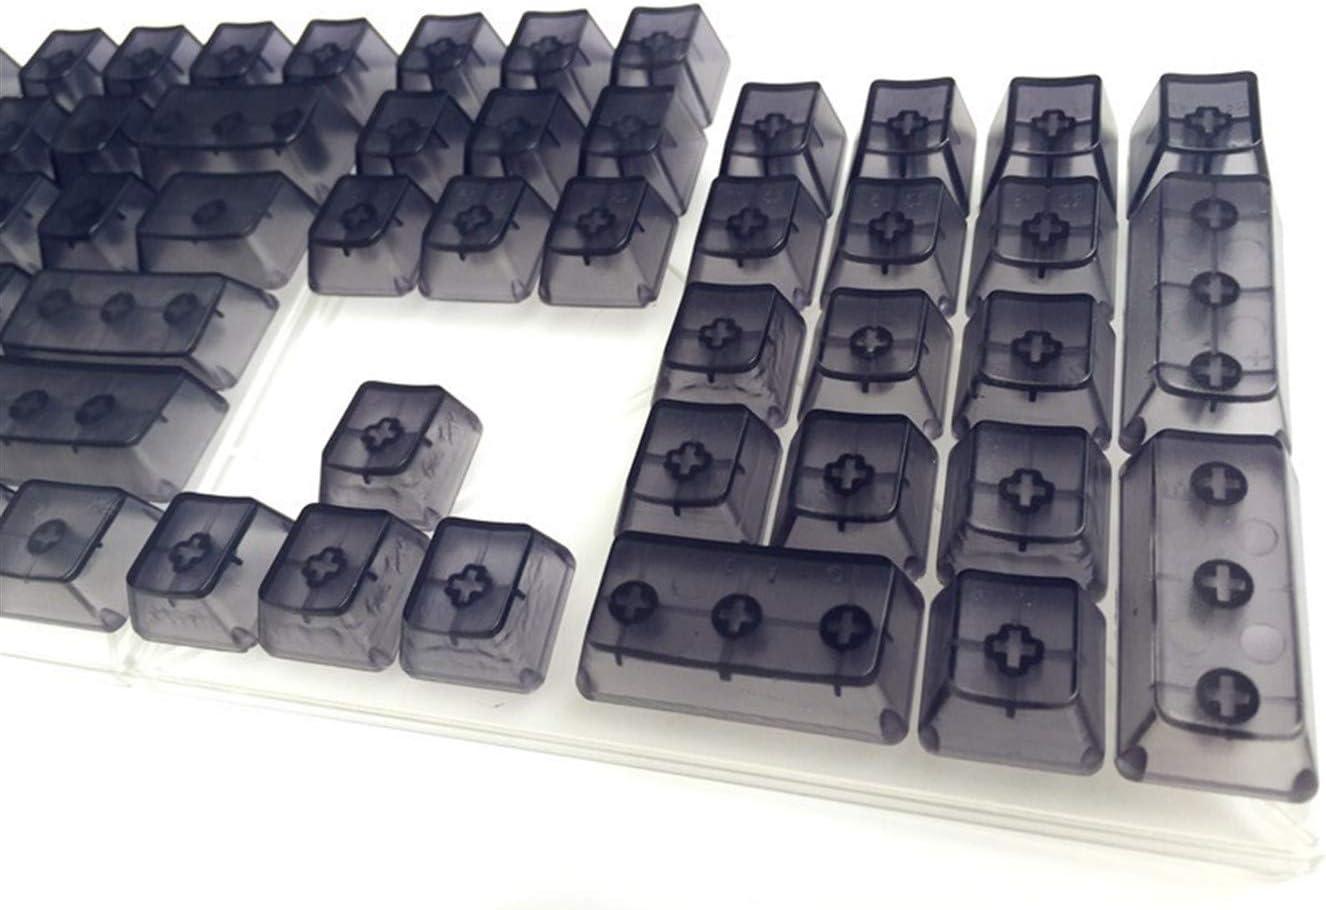 108 Key Mechanical Keyboard Luxury 104 Max 44% OFF BlackTranslucidus Tr Keycap Keys